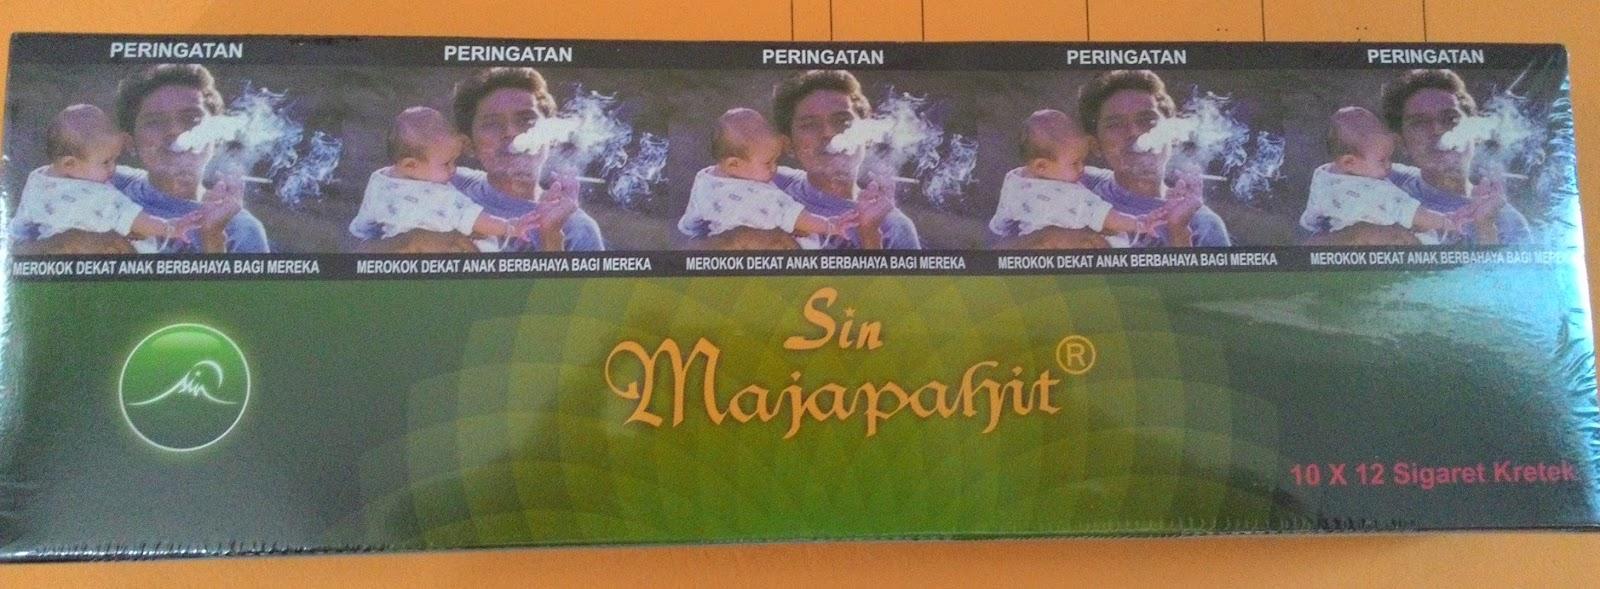 Sin Rokok Herbal Sehat Terapi Hebat Kita Hebal Mdl Mild Majapahit Superrkretek